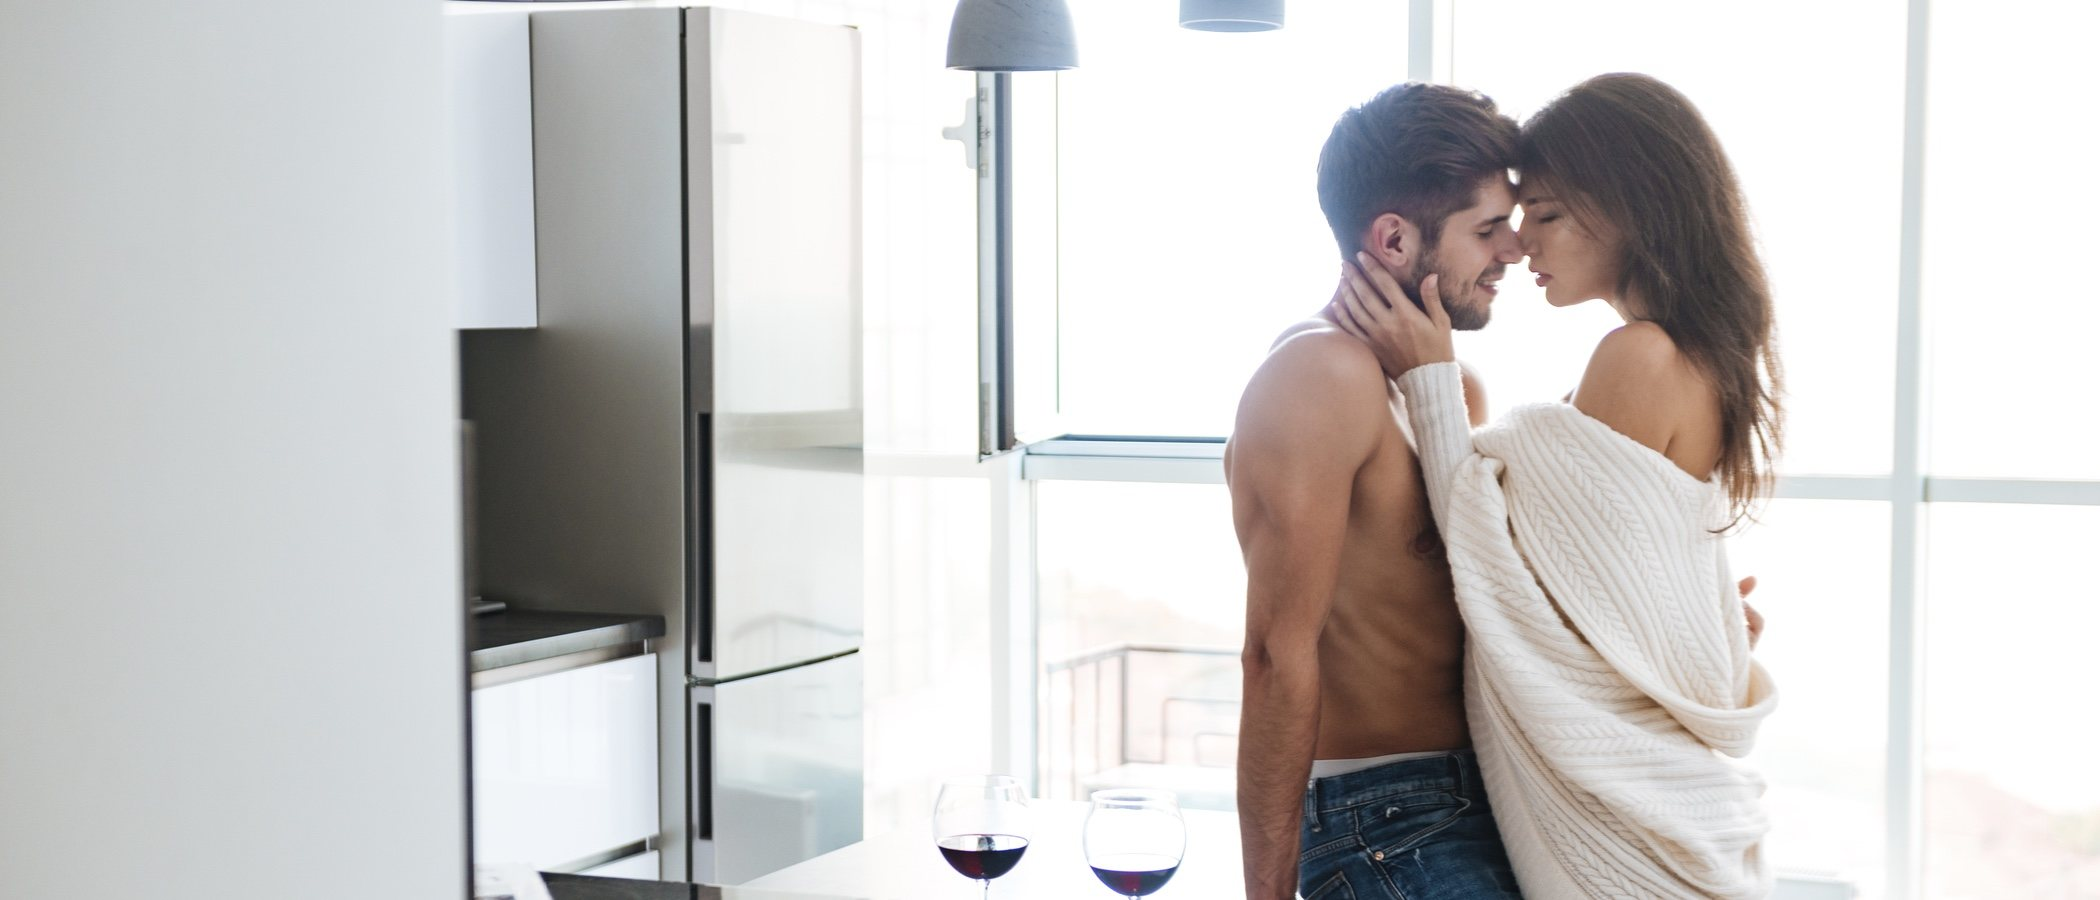 Horóscopo sexual febrero 2019: Escorpio